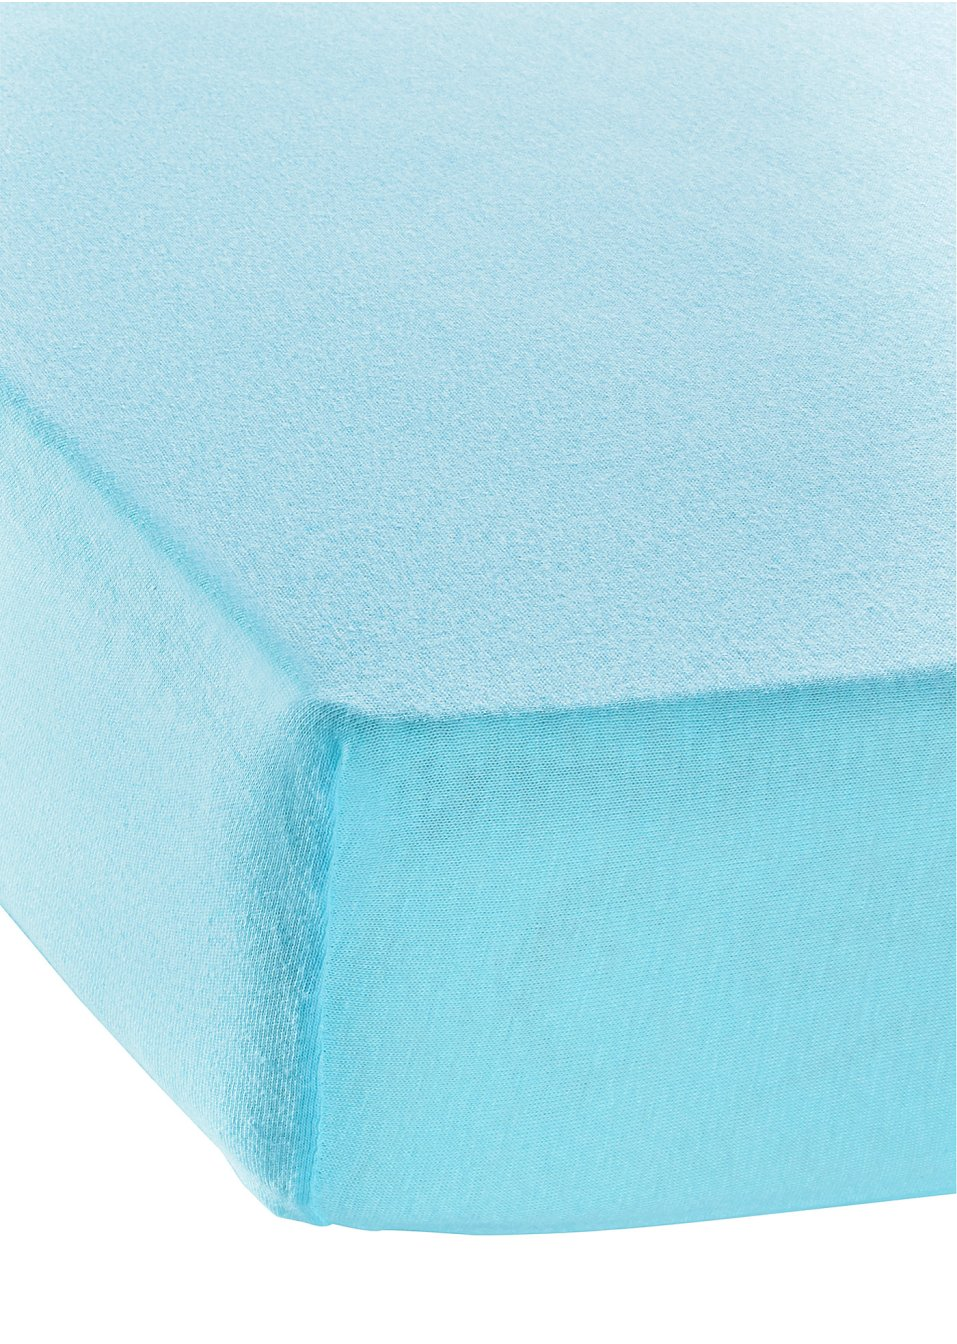 drap housse coton bio bleu blanc bpc living. Black Bedroom Furniture Sets. Home Design Ideas